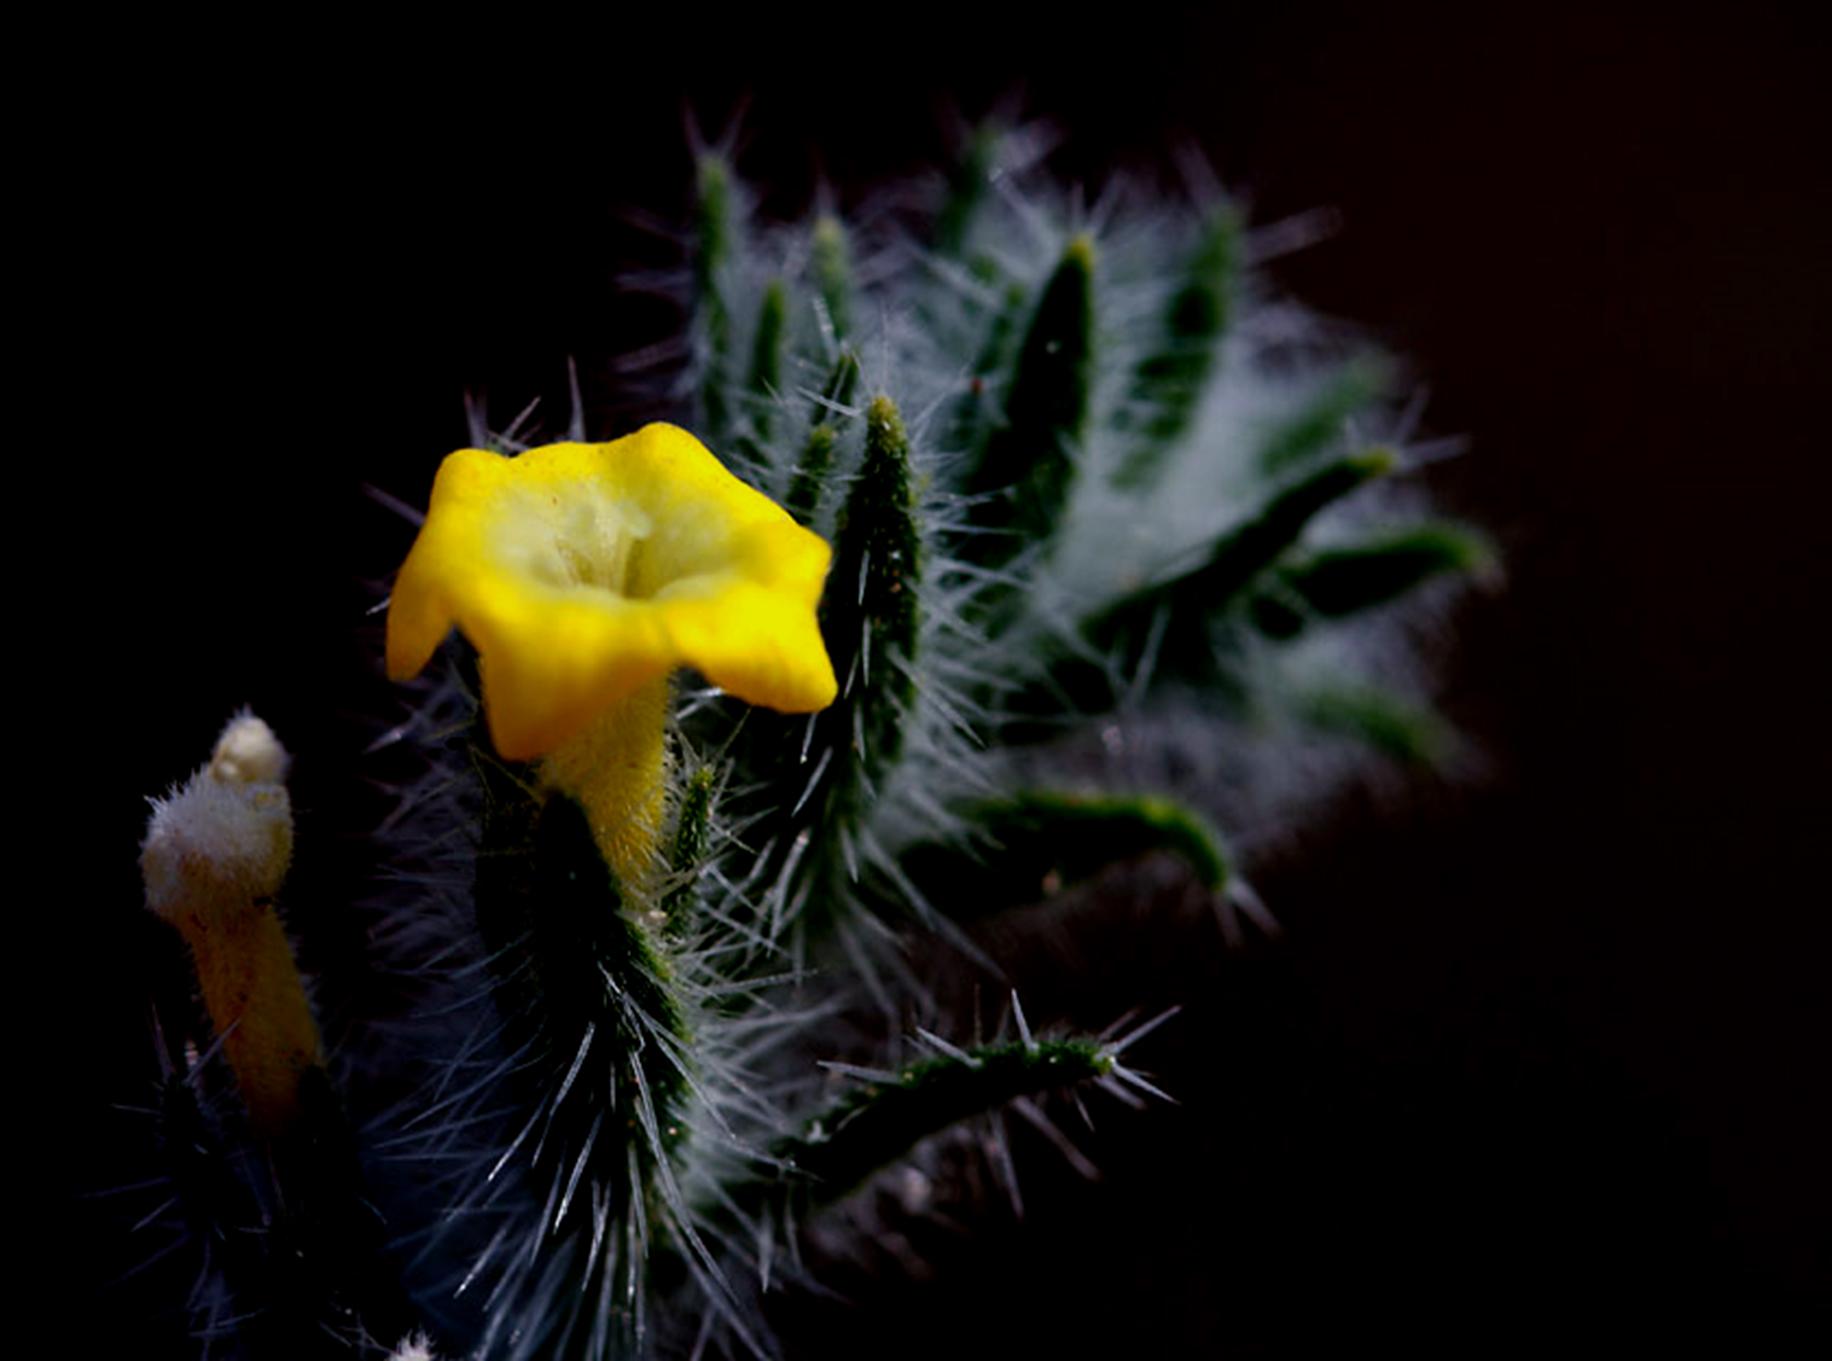 Arnebia hispidissima, which belongs to the family Boraginaceae, is an important medicinal plant of the Indian Thar desert. Photo by Gobind Sagar Bhardwaj.